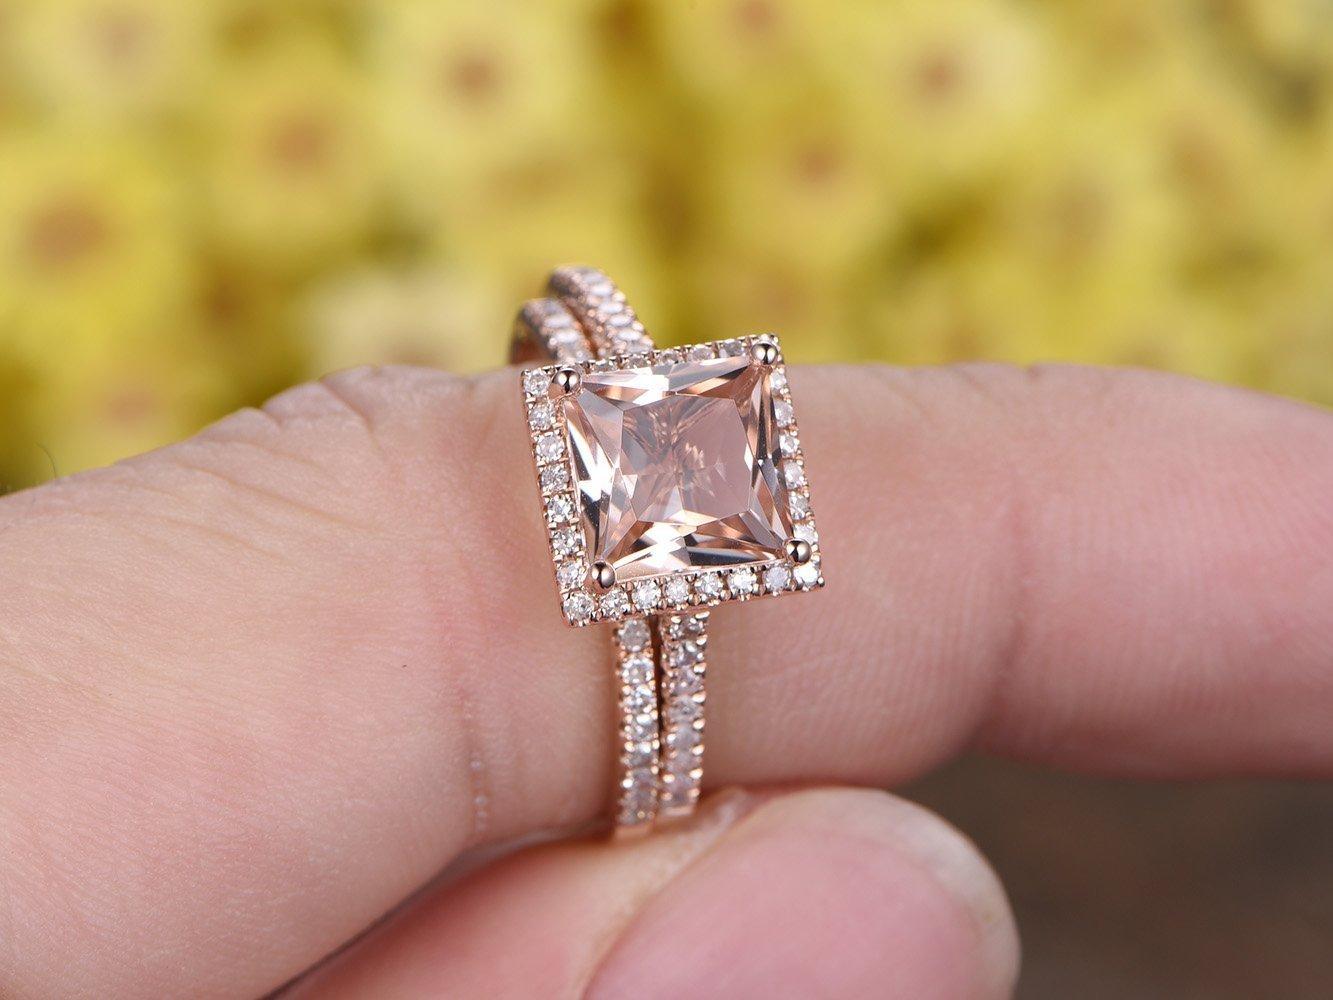 Amazon.com: 2PCS Wedding Ring Set, 8mm Princess Cut VS Pink ...